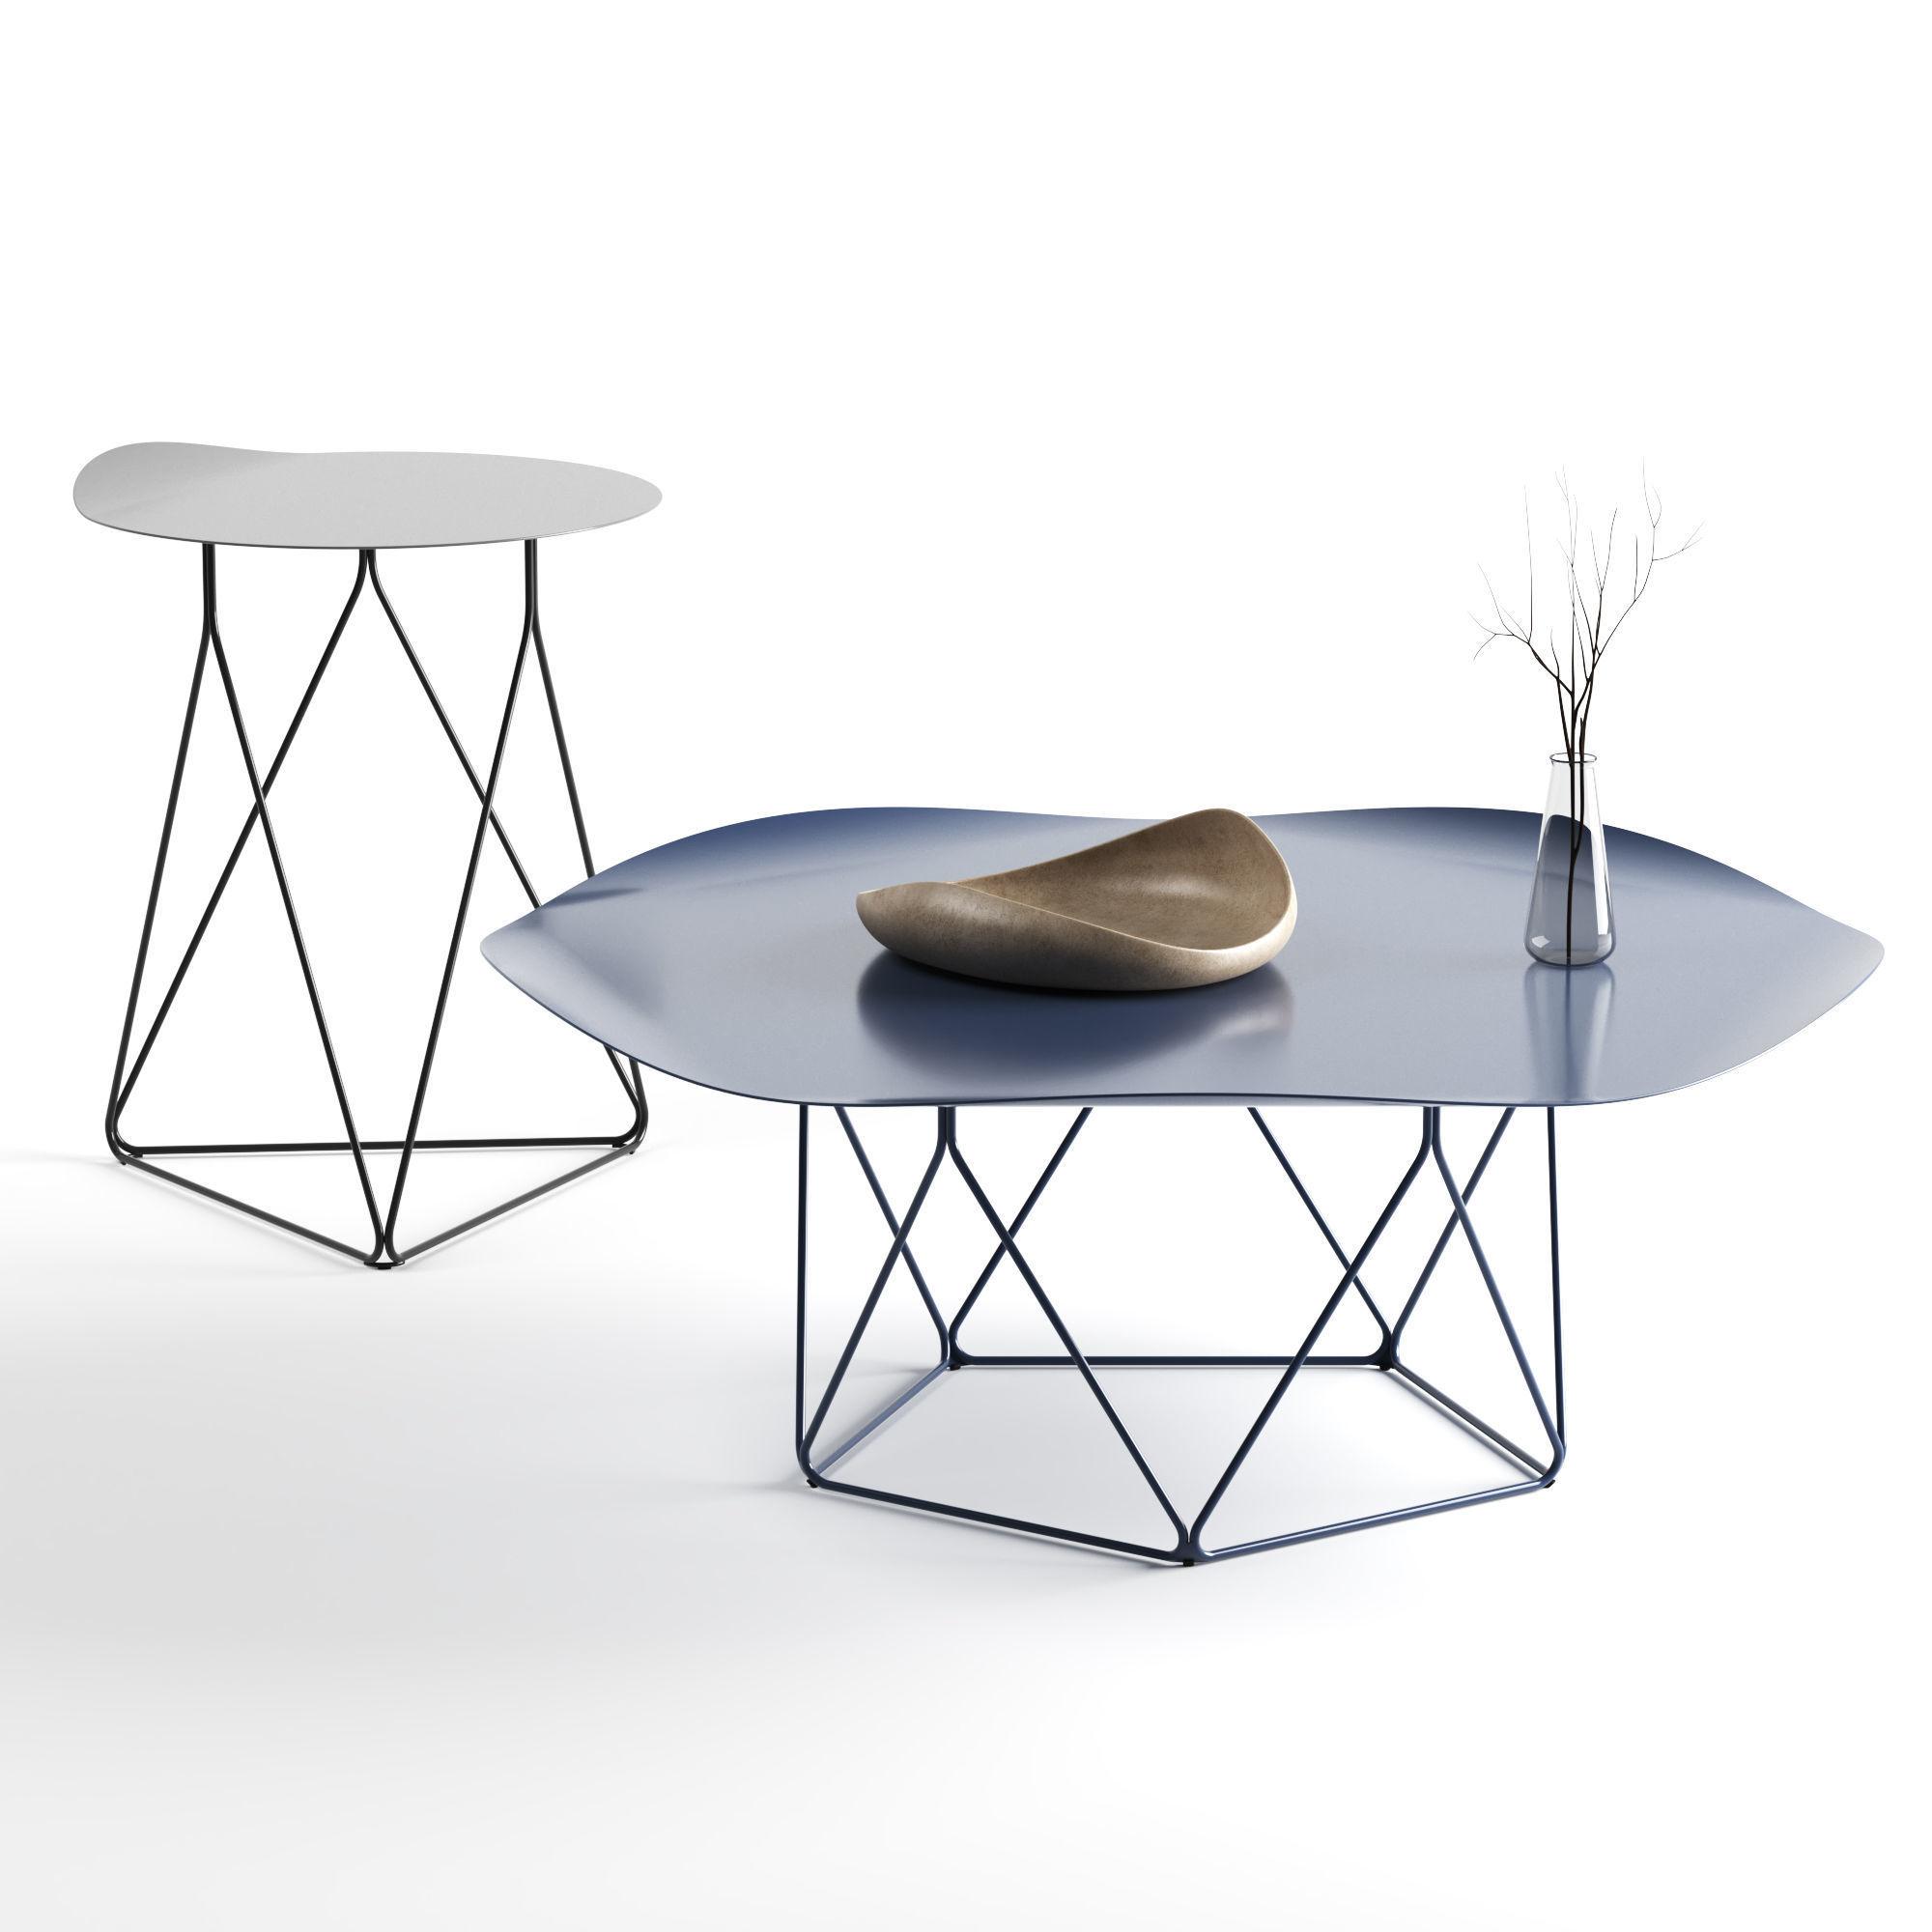 Design Salontafel Leolux.Coda Coffee Table By Leolux 3d Model Cgtrader